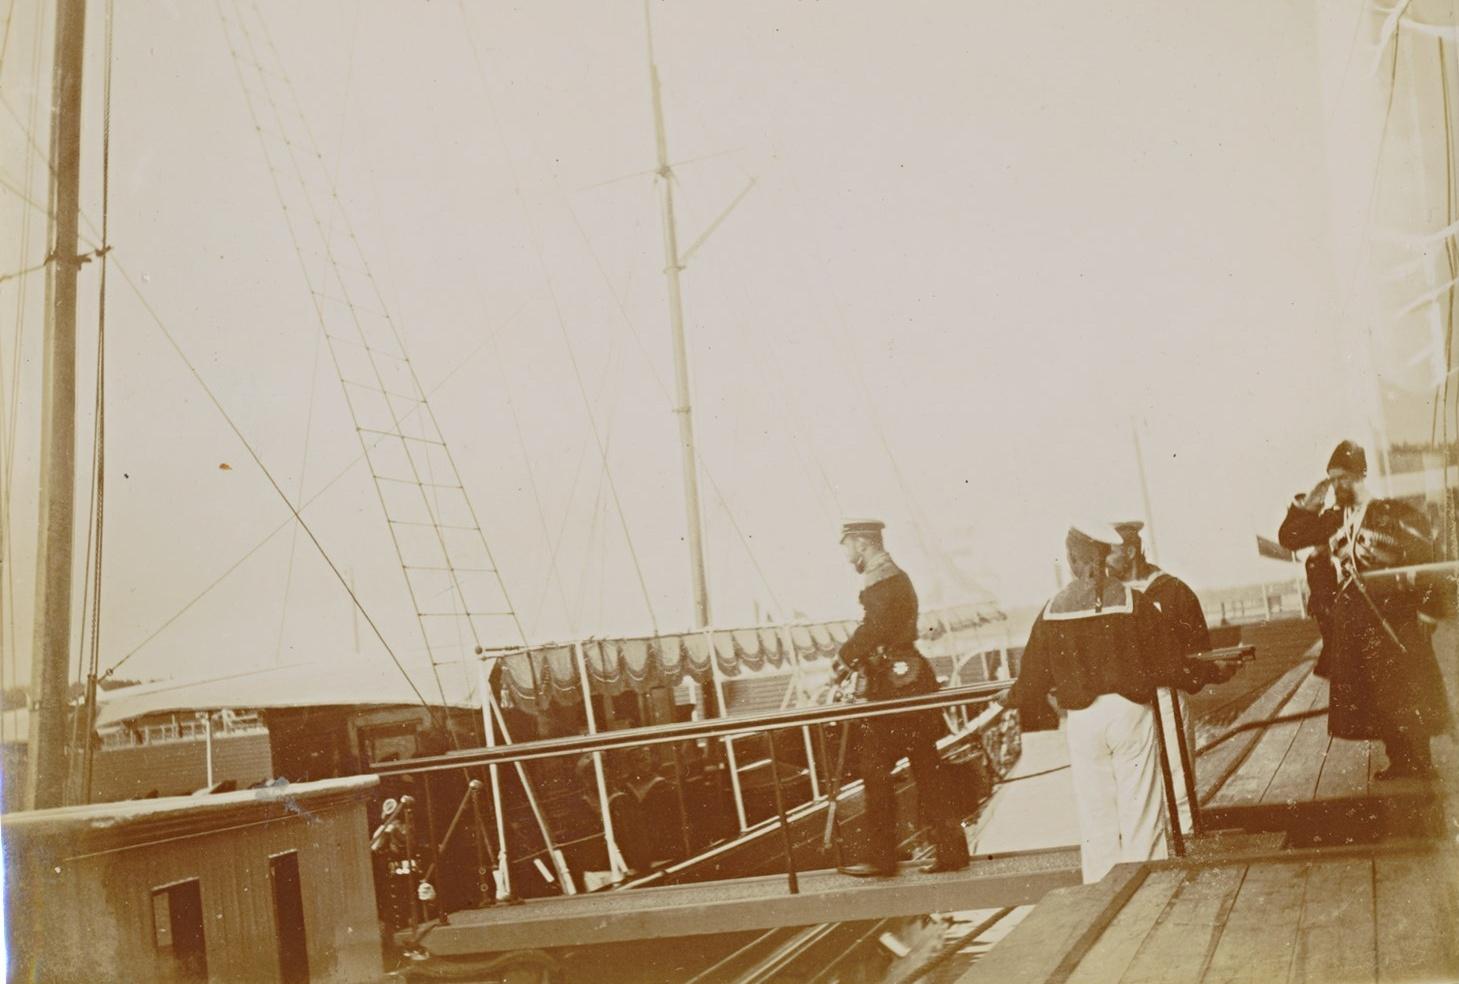 Император Николай II сходит с Петергофского дебаркадера на яхту «Александрия»